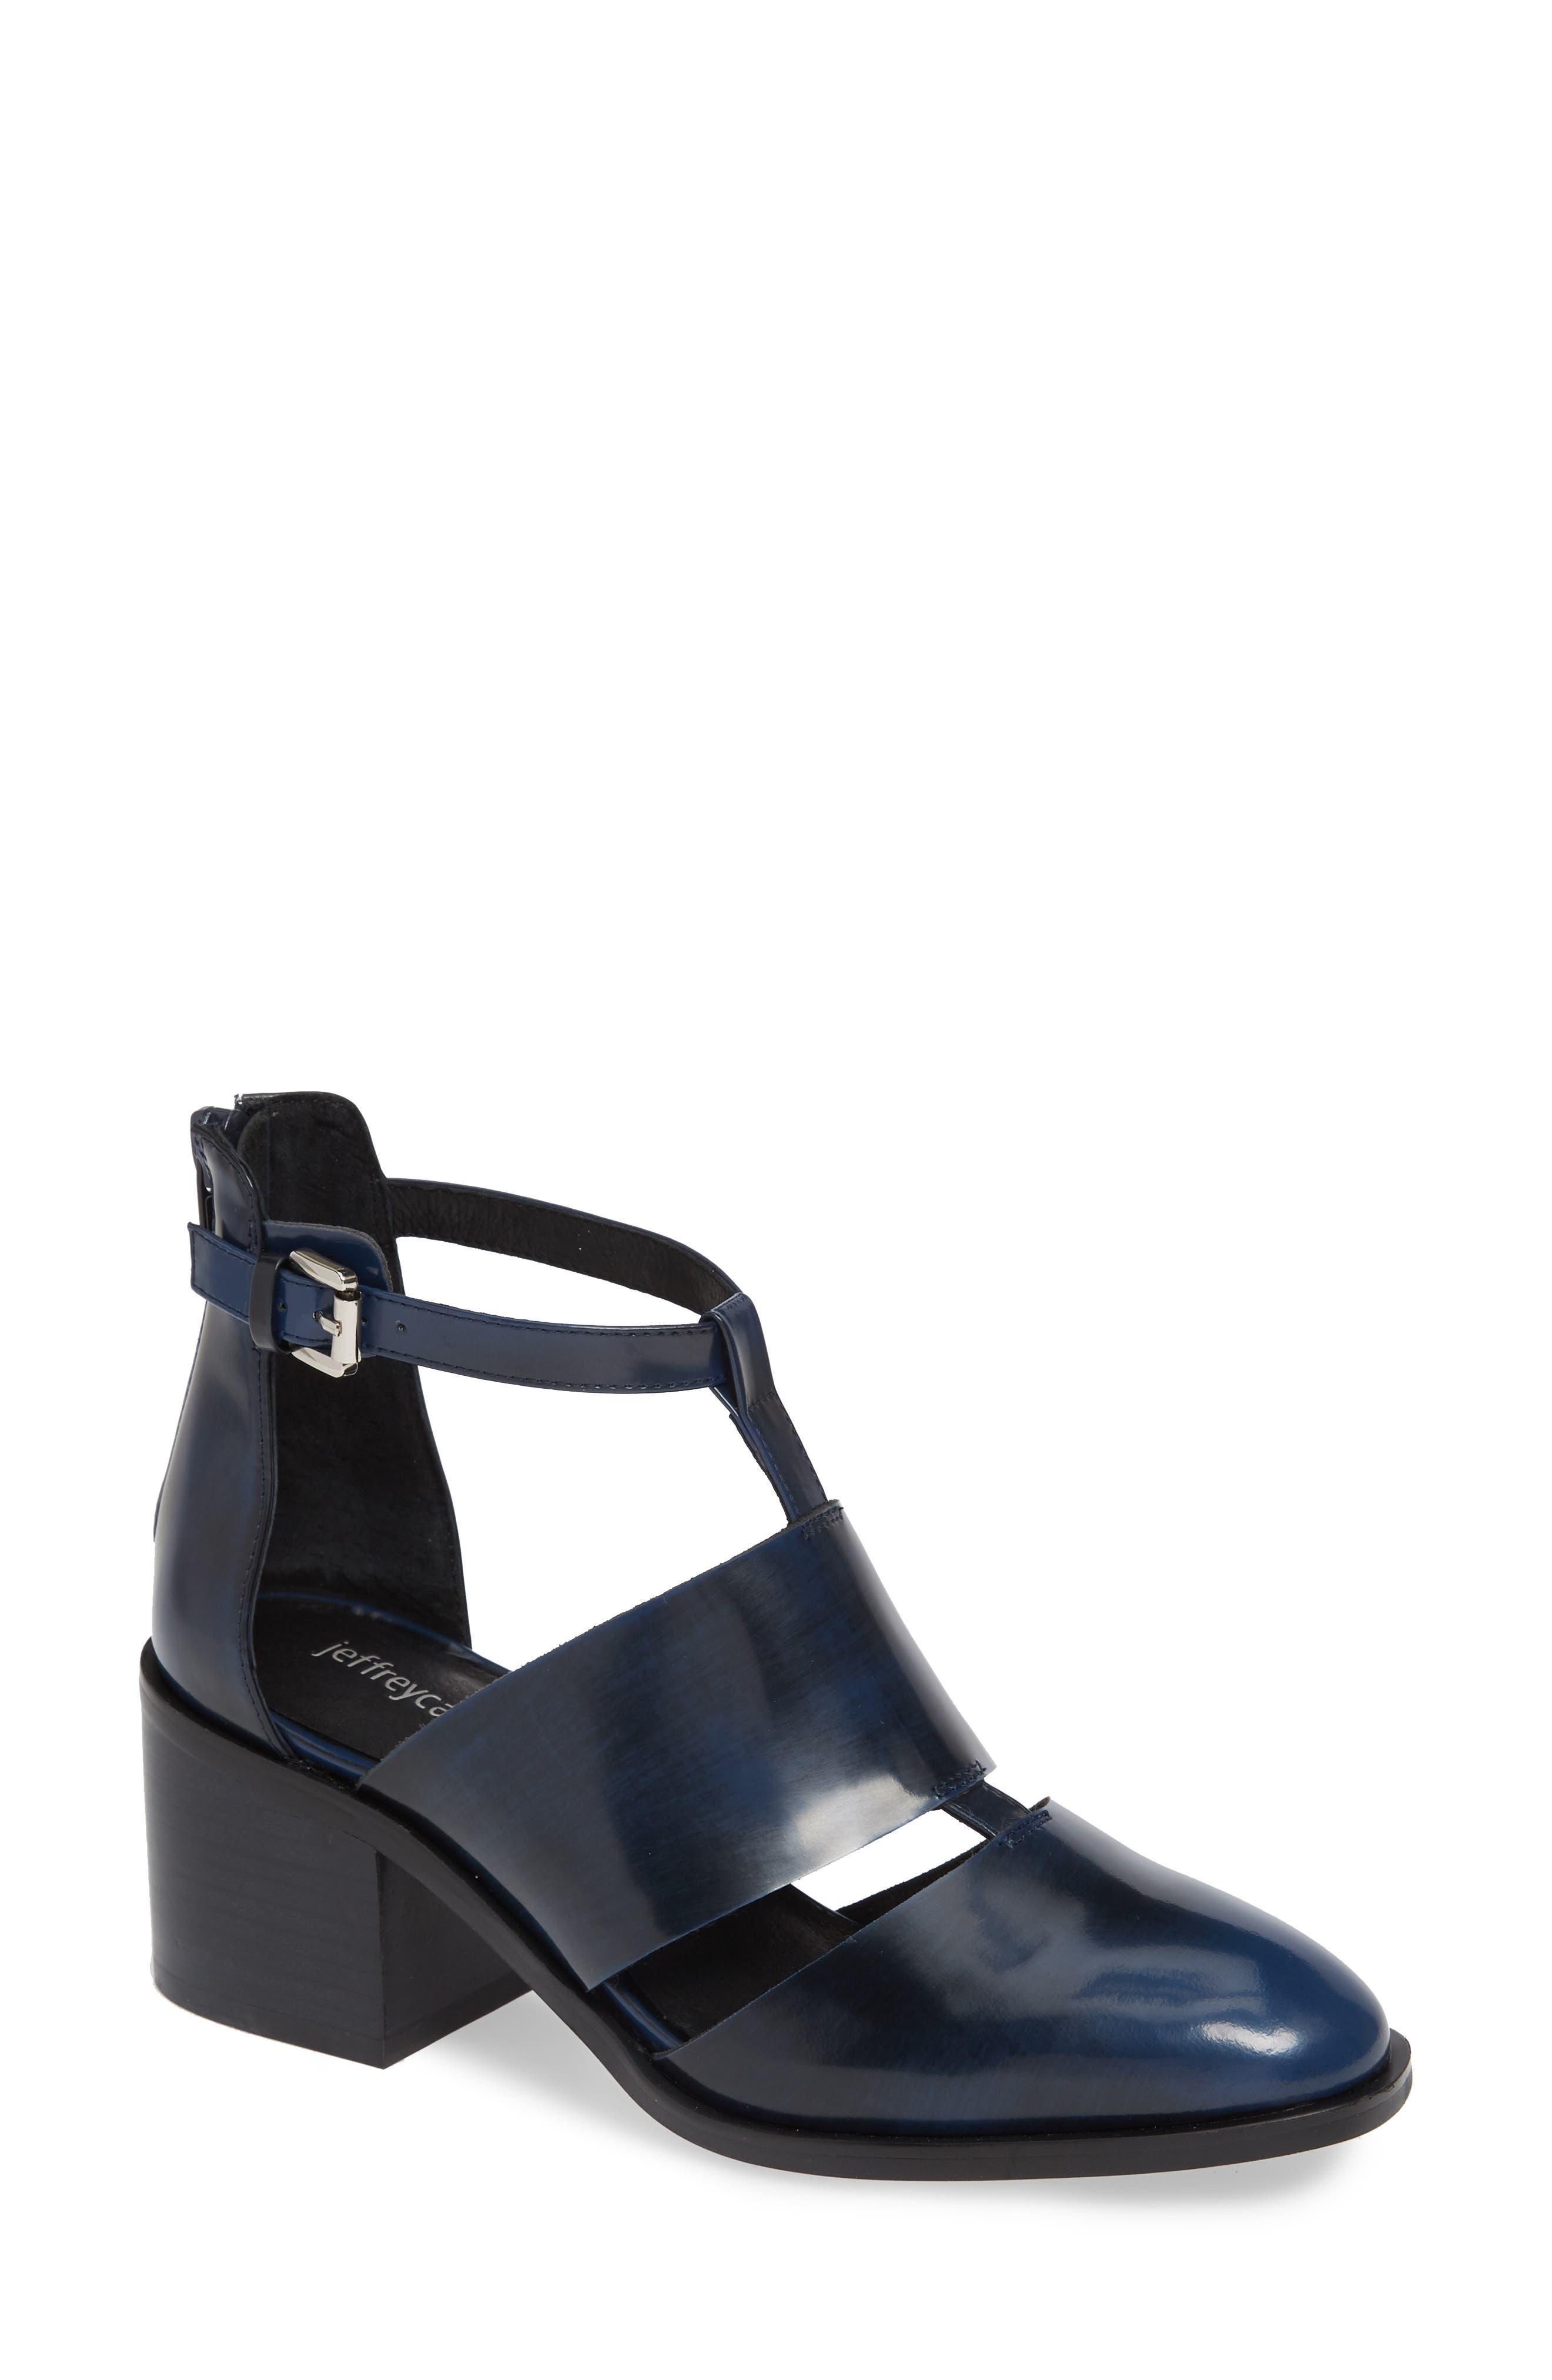 'Melina' T-Strap Shoe,                         Main,                         color, NAVY RUB OFF